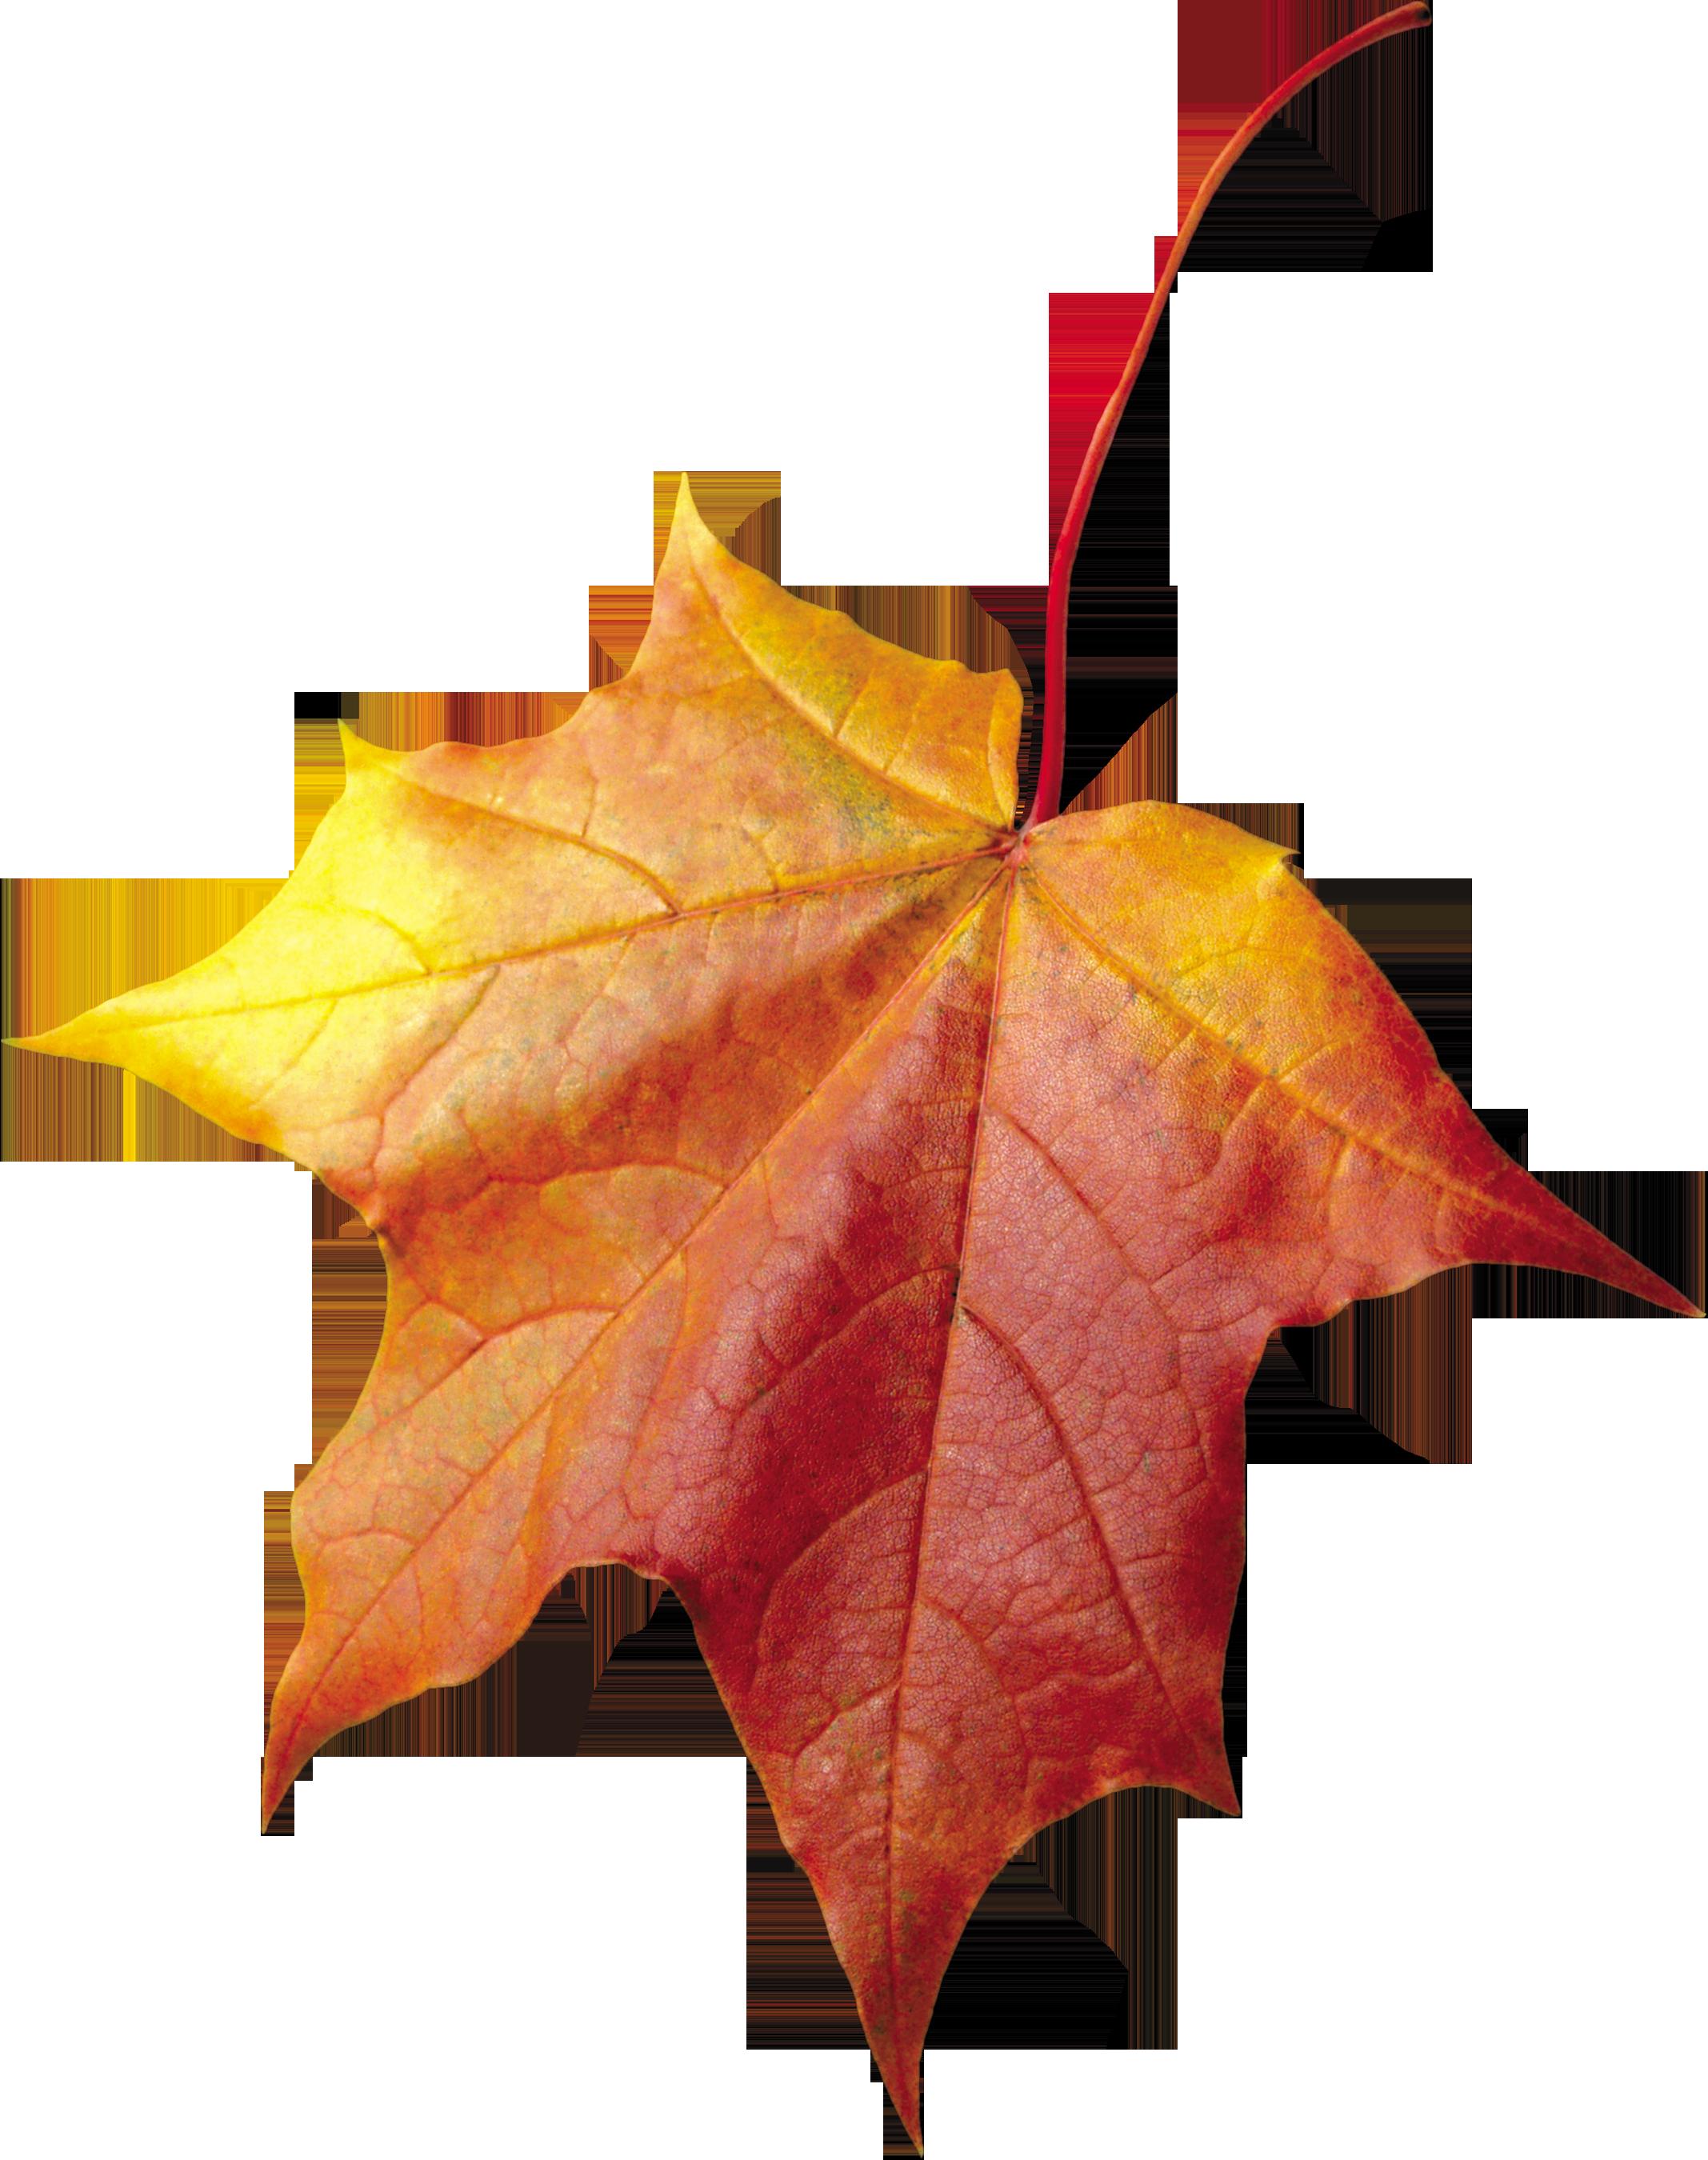 Maple Autumn Leaf PNG Image - PurePNG | Free transparent ...